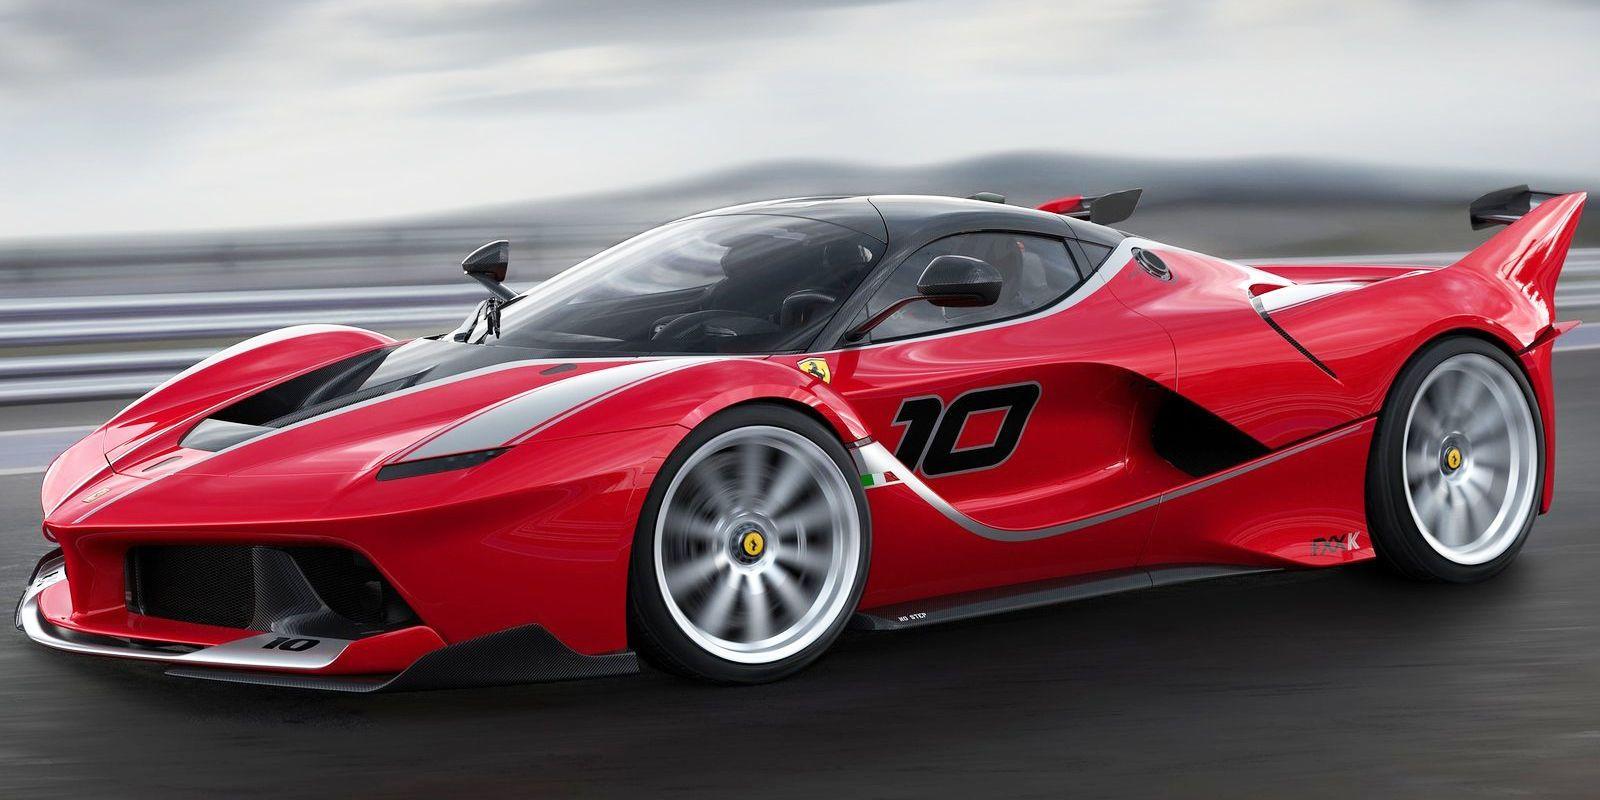 Ferrari Won T Set A Nurburgring Lap Time With The Fxx K Stop Asking Ferrari Fxxk Ferrari Fxx Sports Cars Ferrari